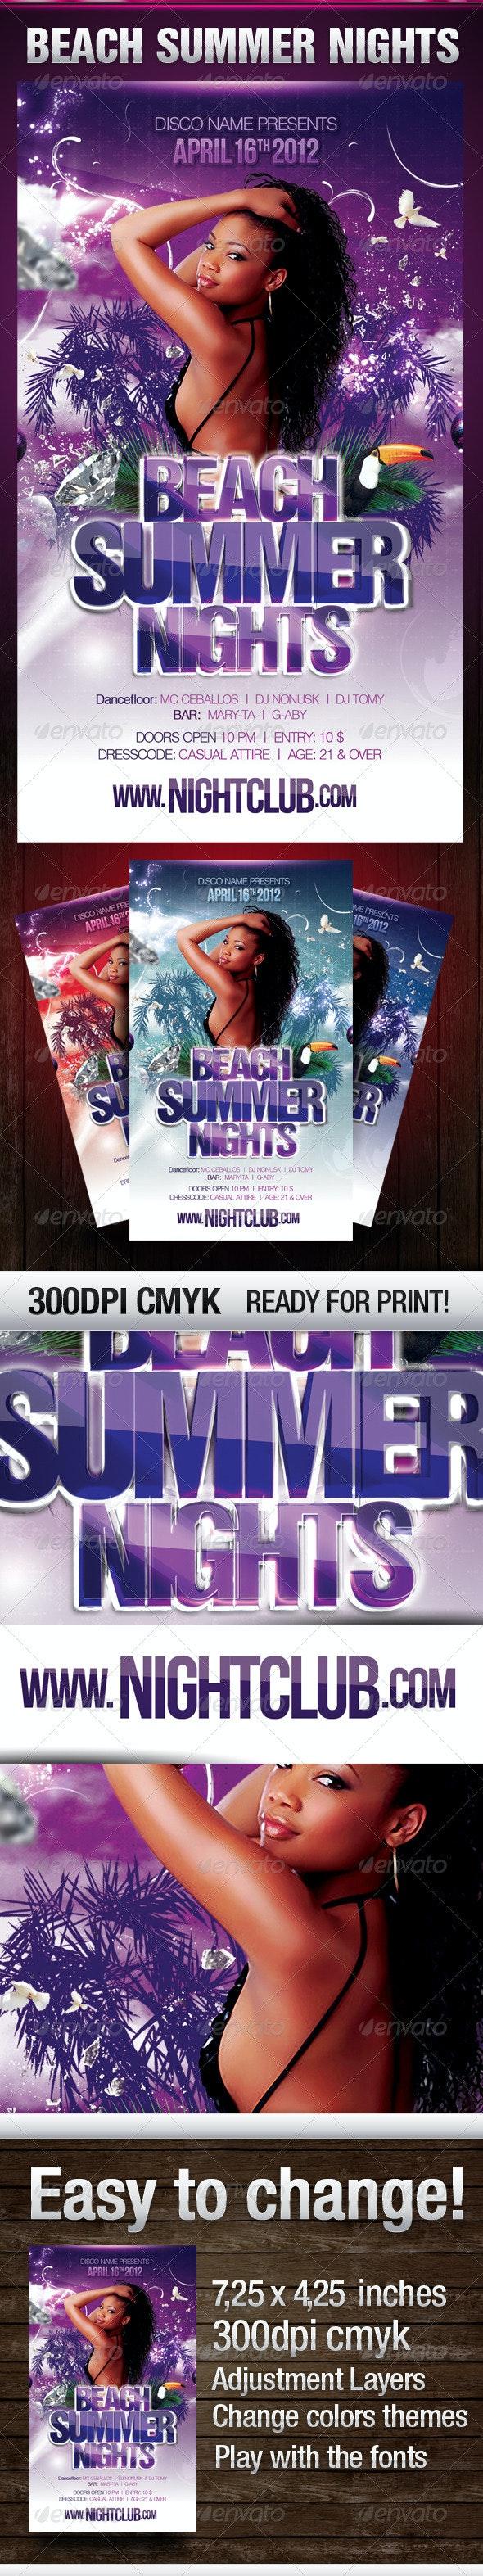 Beach Summer Nights Flyer - Flyers Print Templates